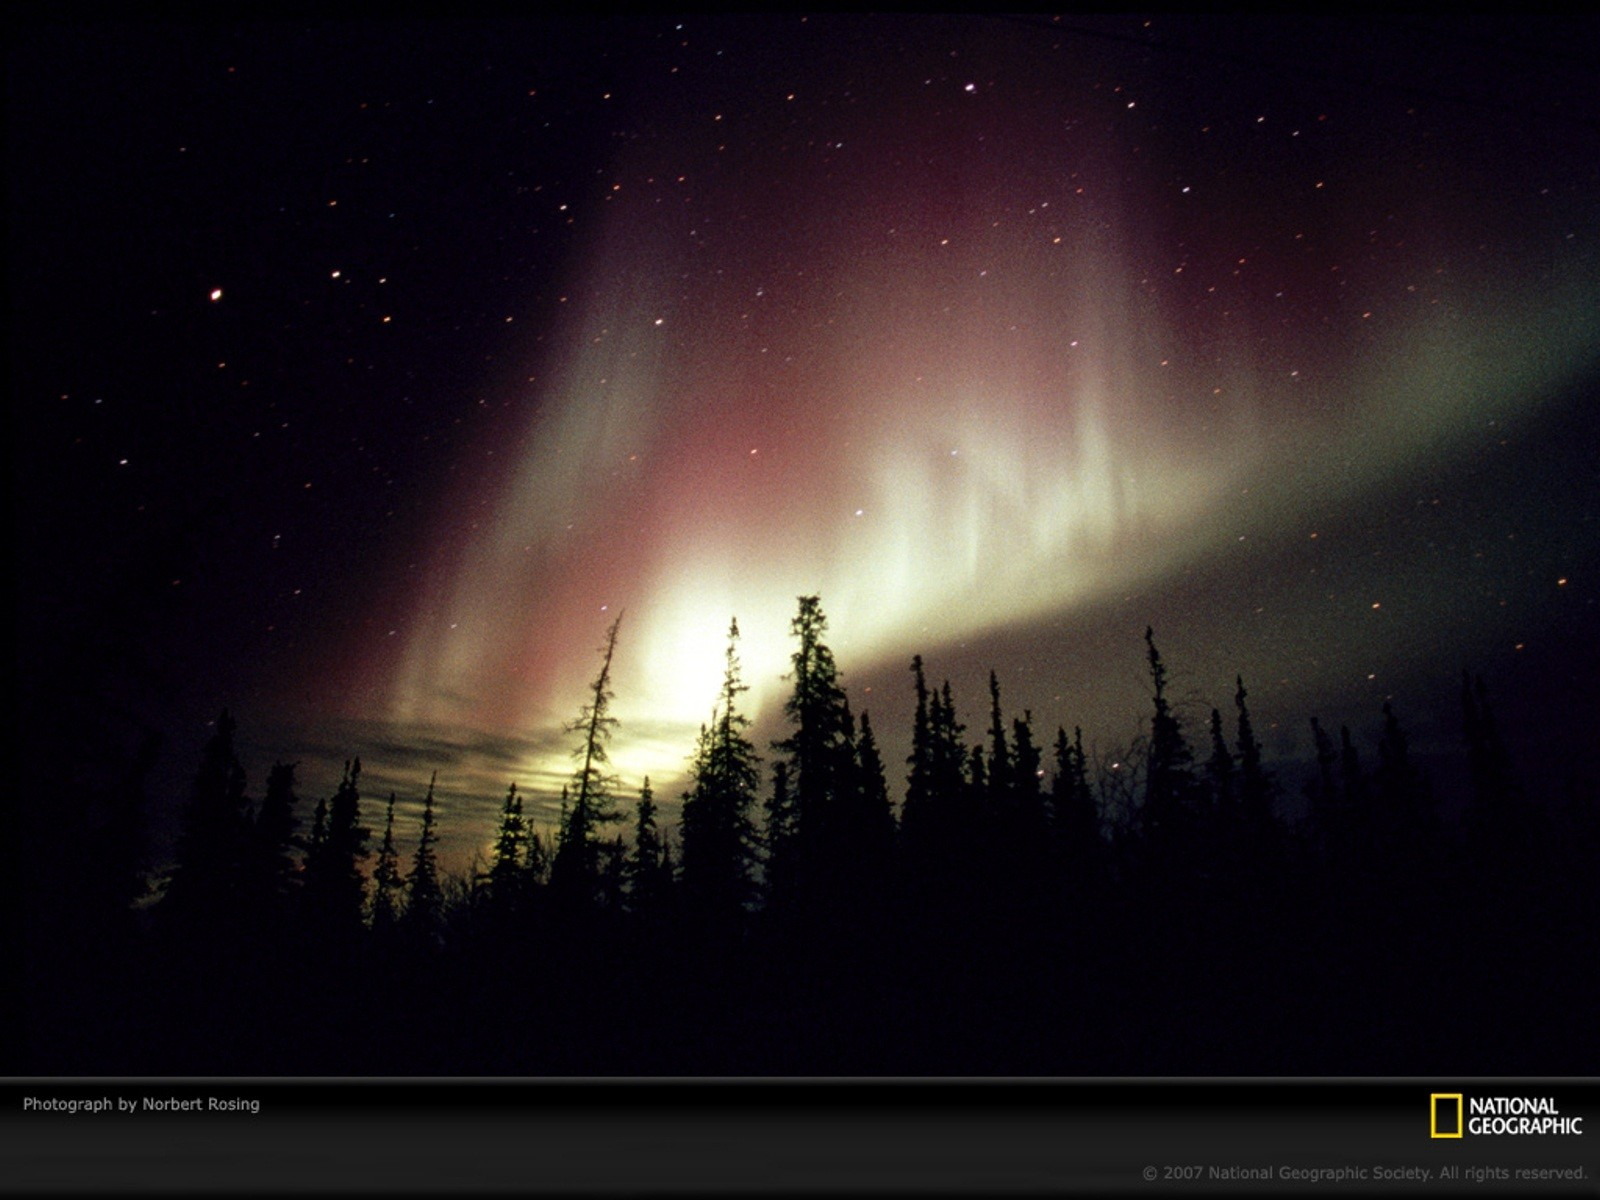 http://1.bp.blogspot.com/-ZjgeTq1ei5w/Tm1pbYyLzfI/AAAAAAAAA7k/UGYCVk3tAPc/s1600/aurora_borelias_nothern_lights_national_georaphic_www.Vvallpaper.net.jpg